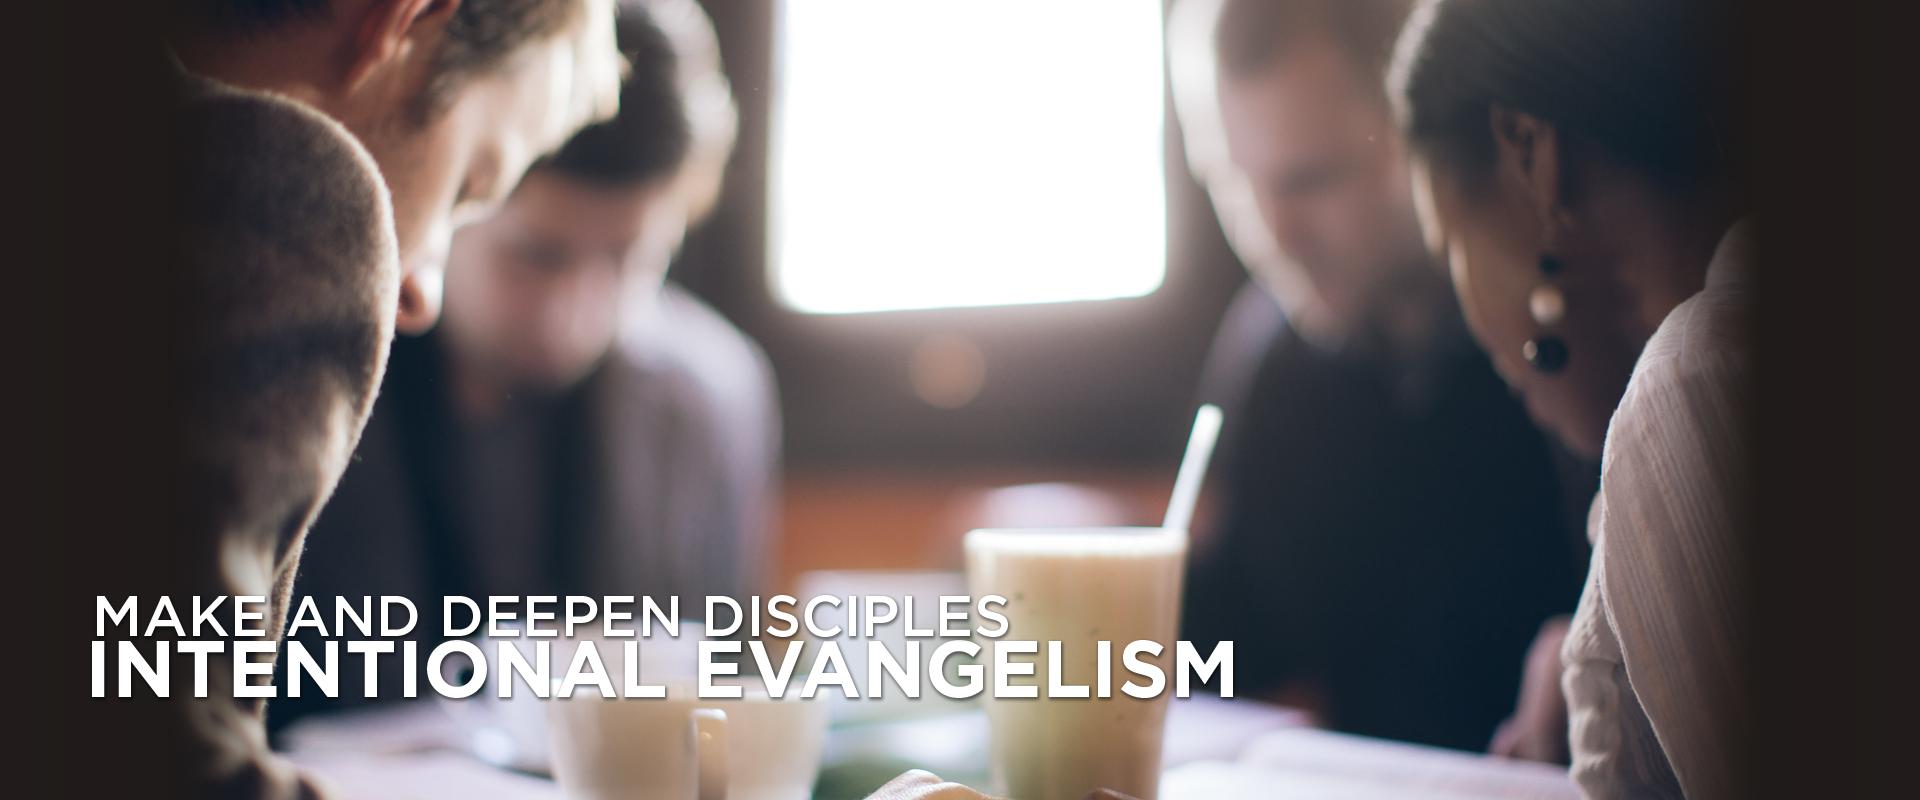 evangelism-banner